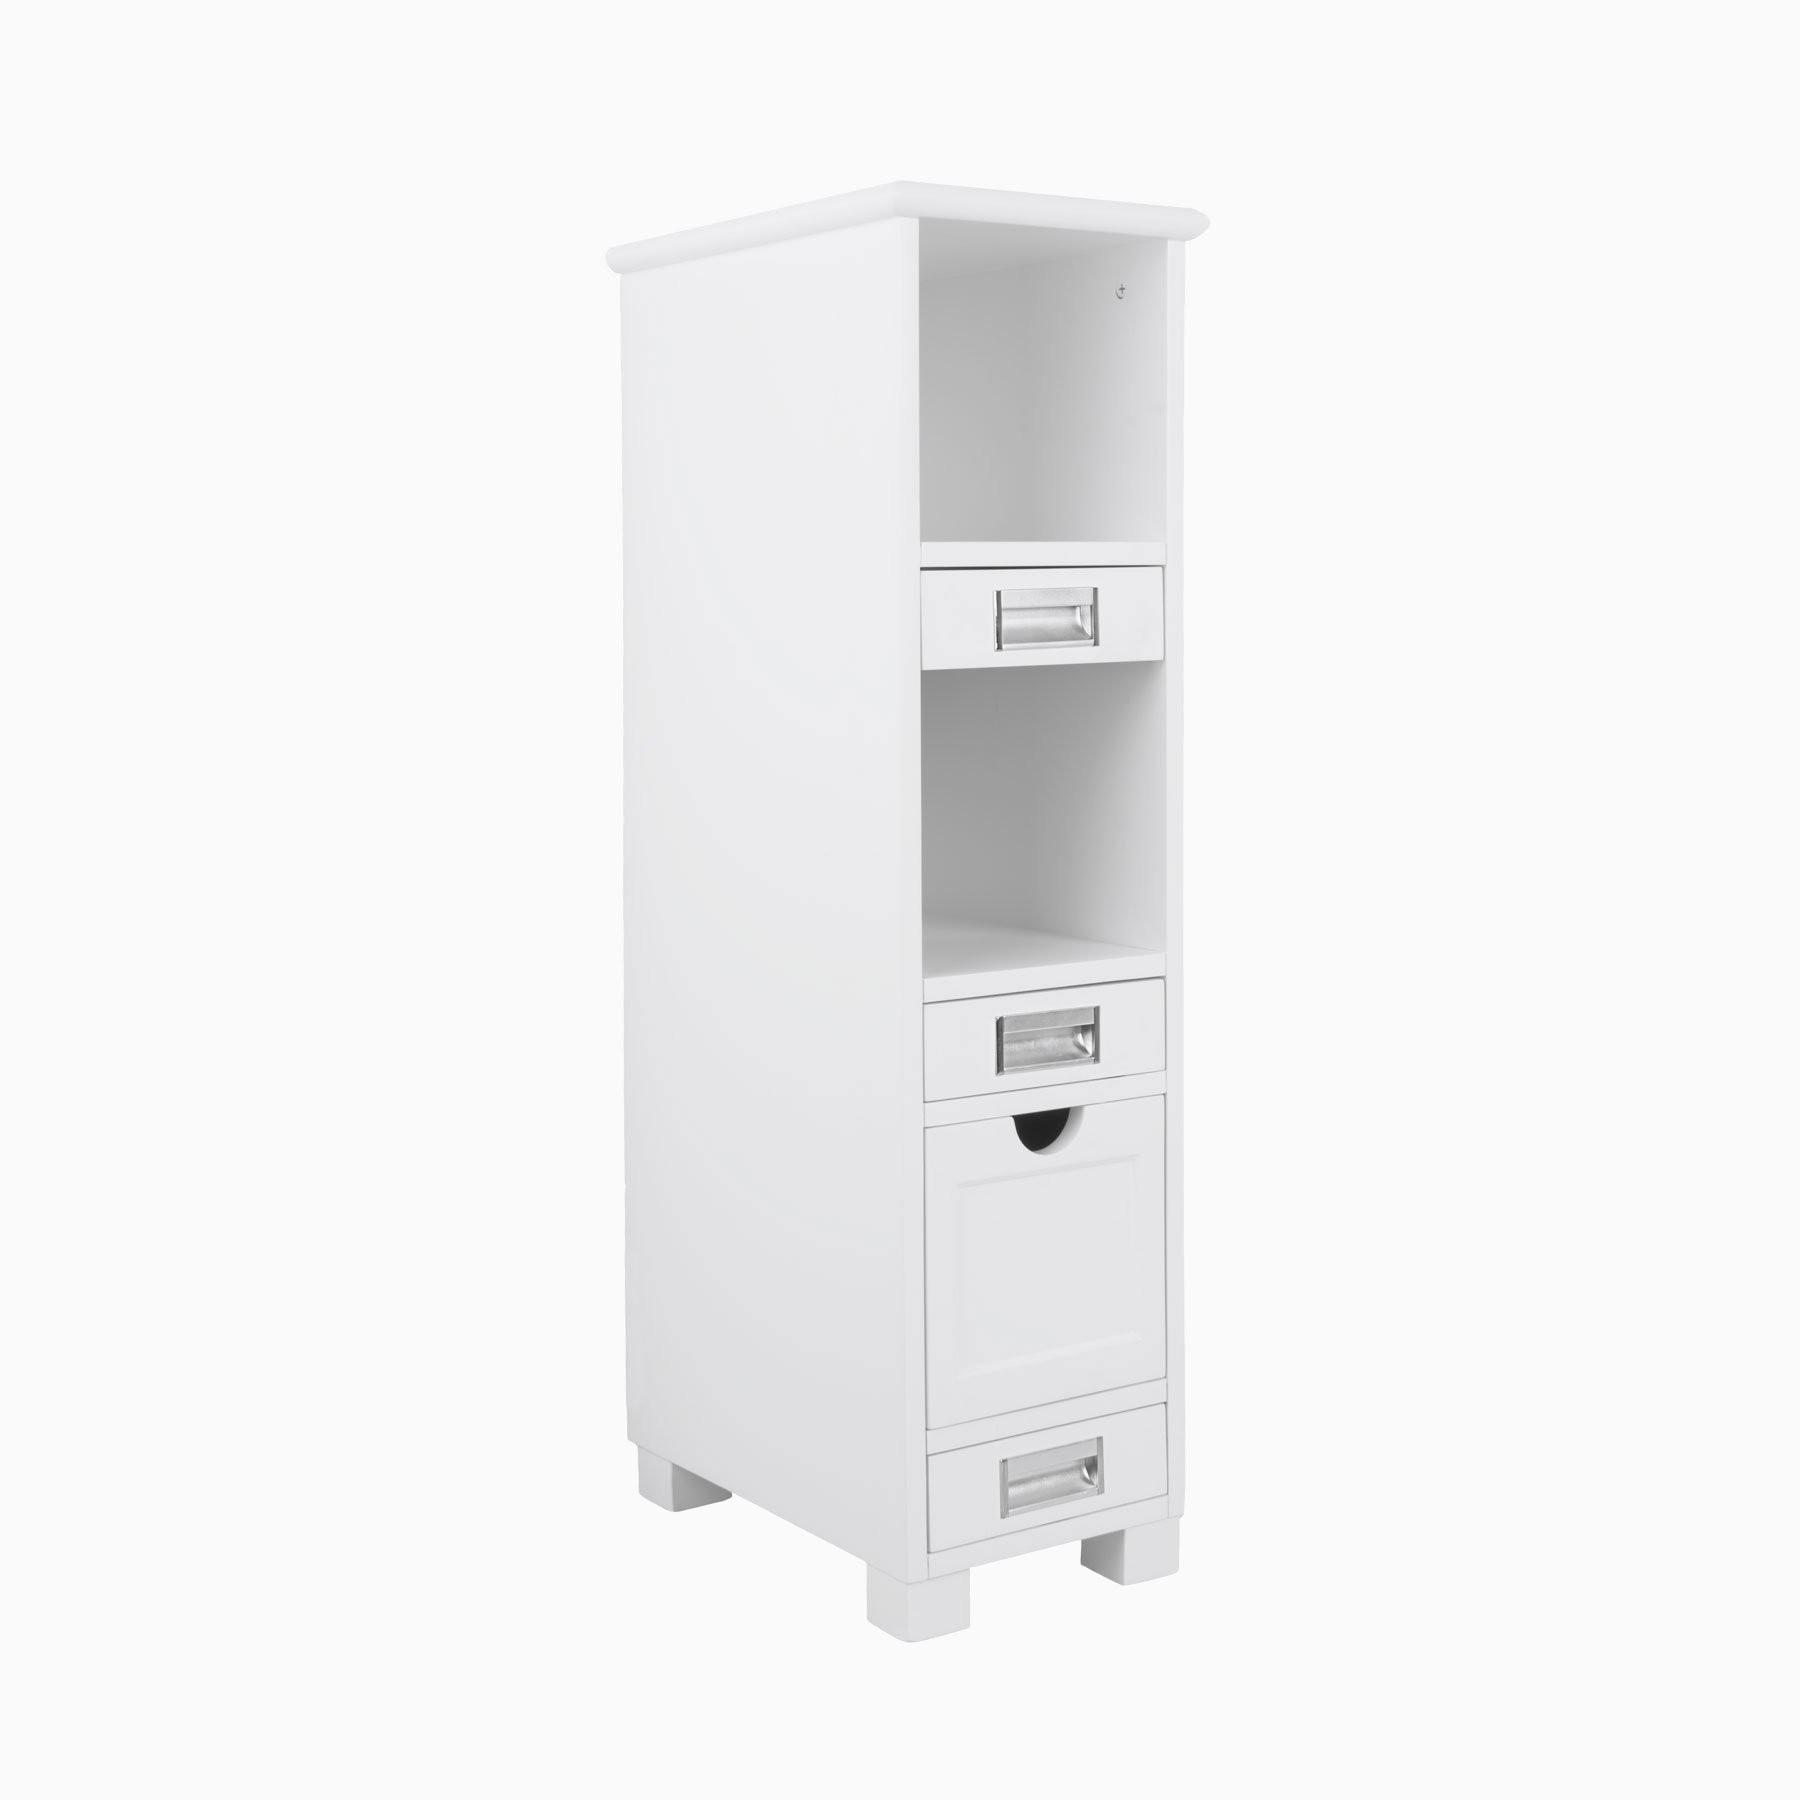 12 Inch Burton Floor Cabinet in White - Bathroom Cabinet